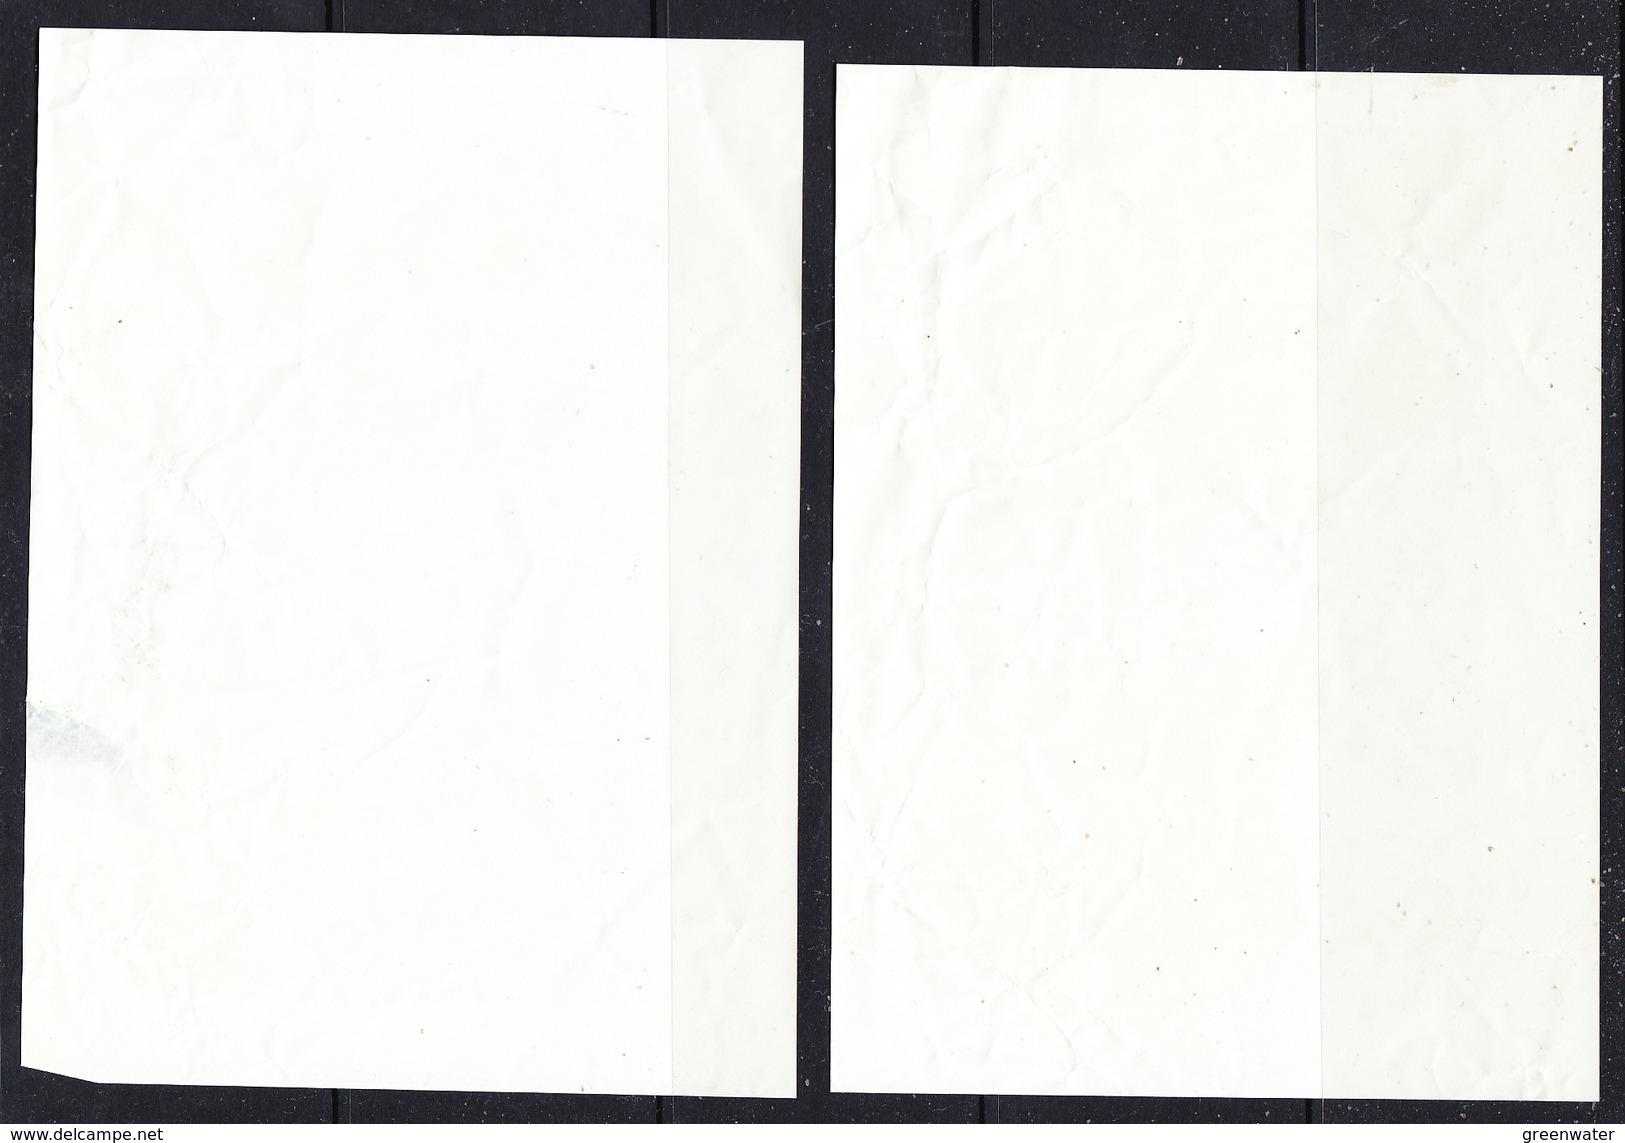 Europa Cept 2005 Bosnia/Herz Sarajevo 2v 2 Shtlts IMPERFORATED / With Wrinkles, 1 Shtlt With Crack & Thin ** Mnh (36061) - 2005